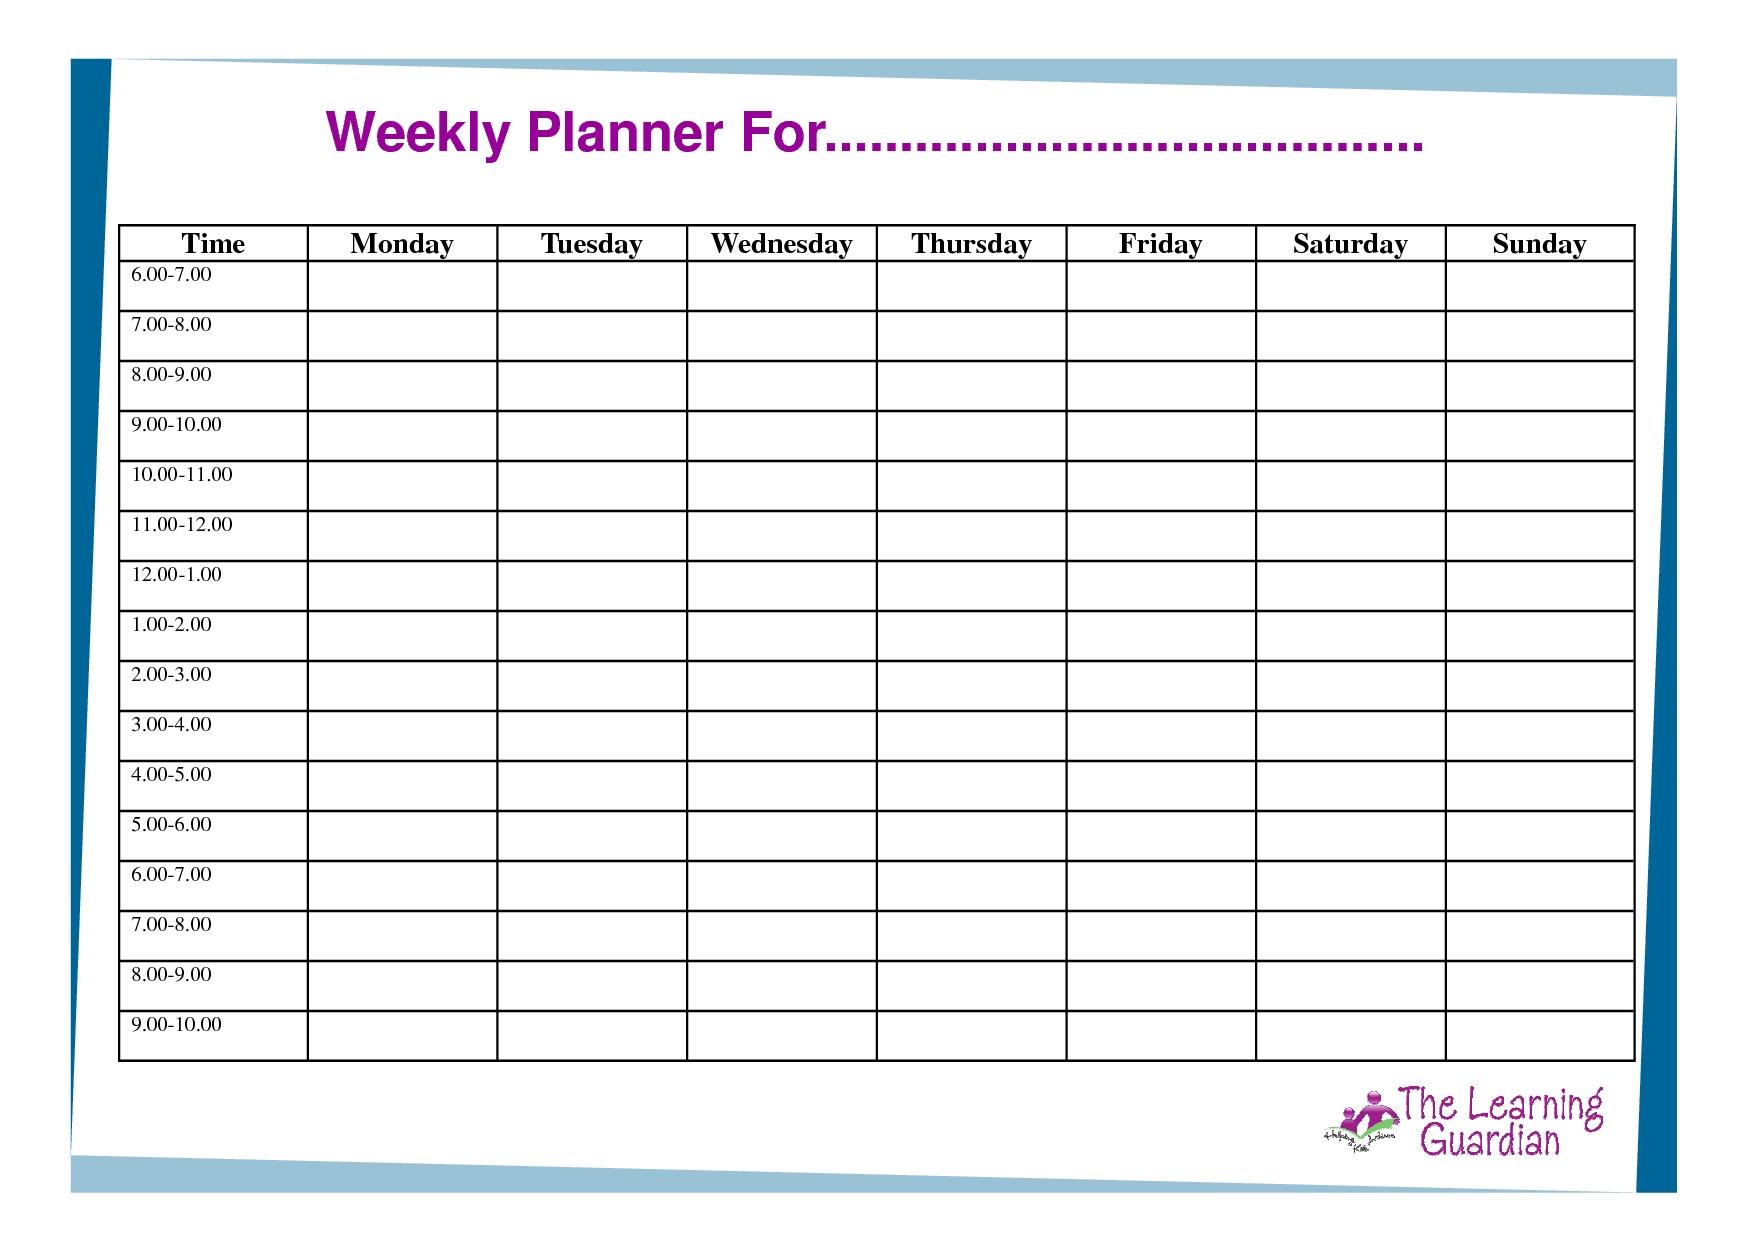 Free Printable Weekly Calendar Templates | Weekly Planner-Monday Friday Calendar Template Printable